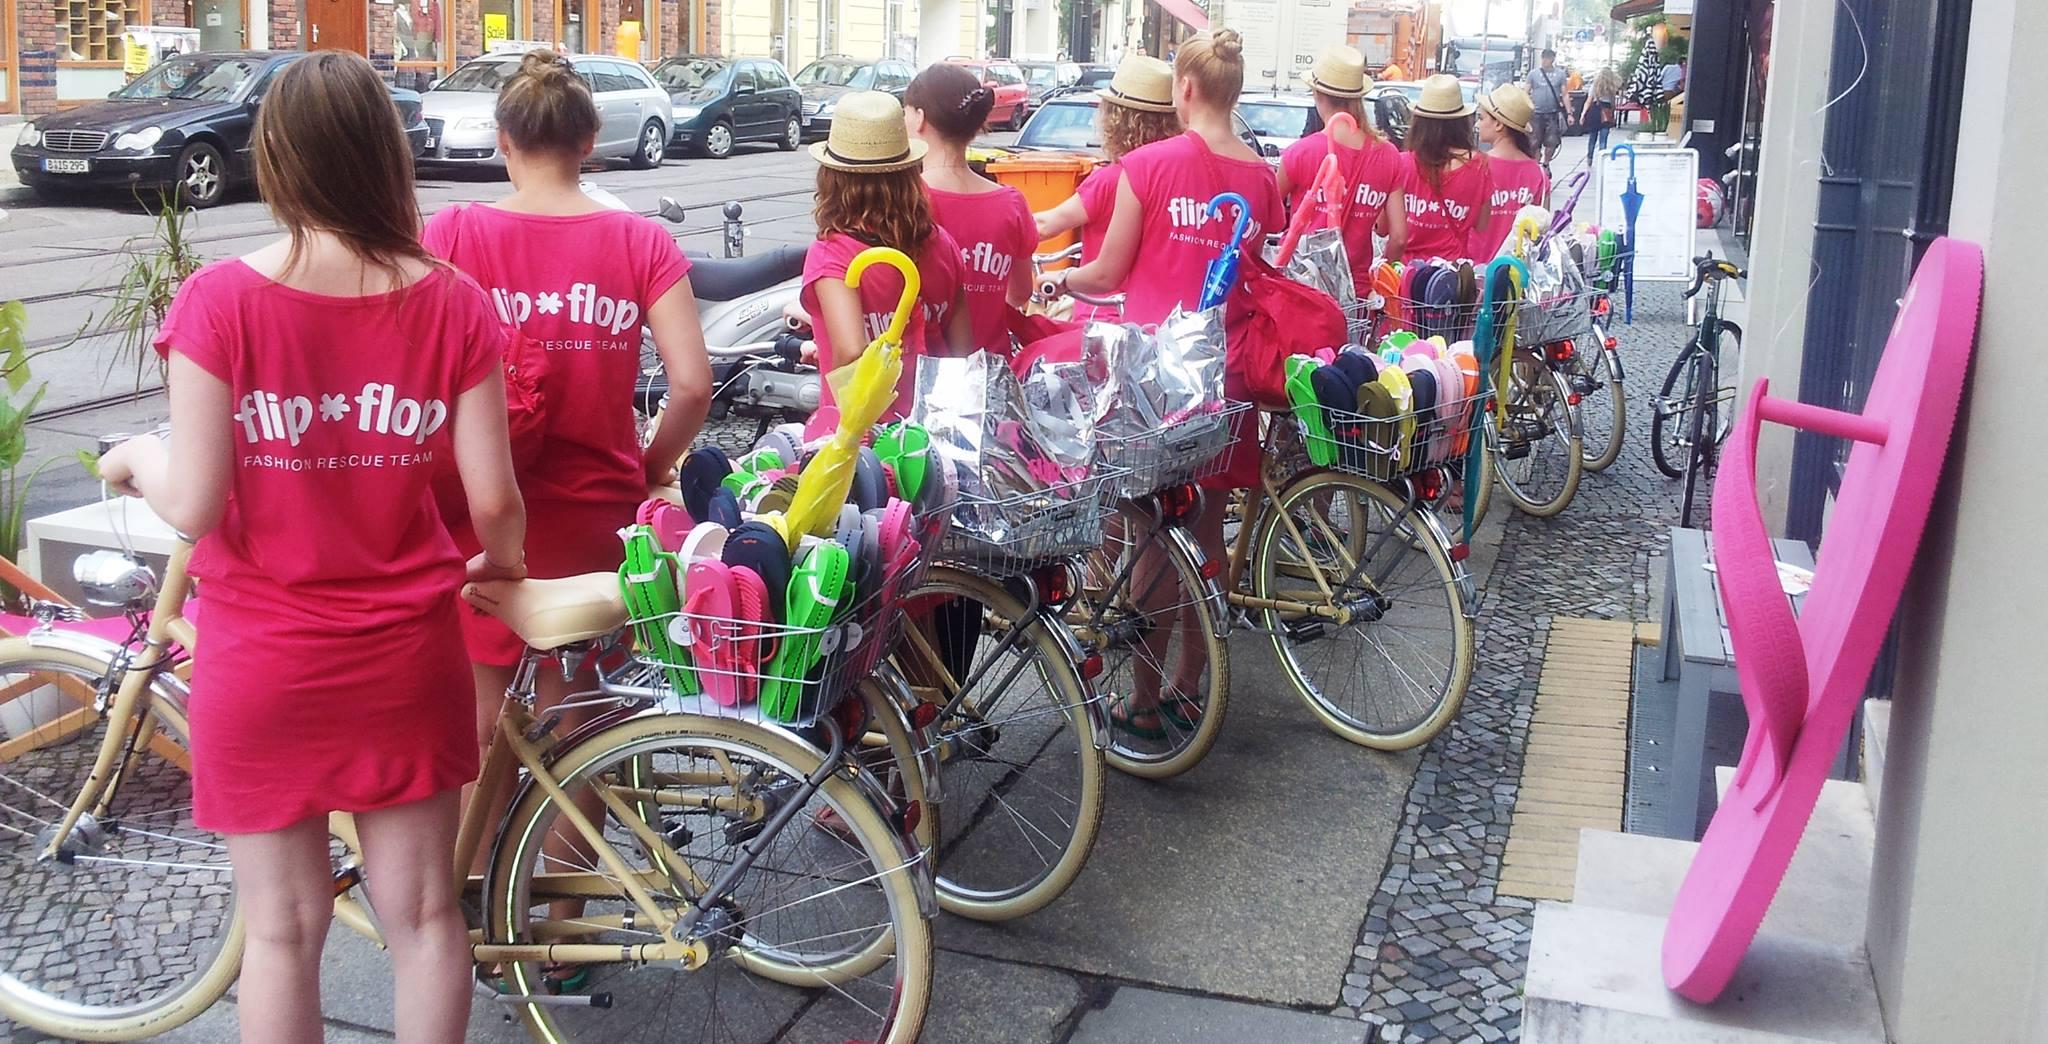 Amsterdam Hostesses